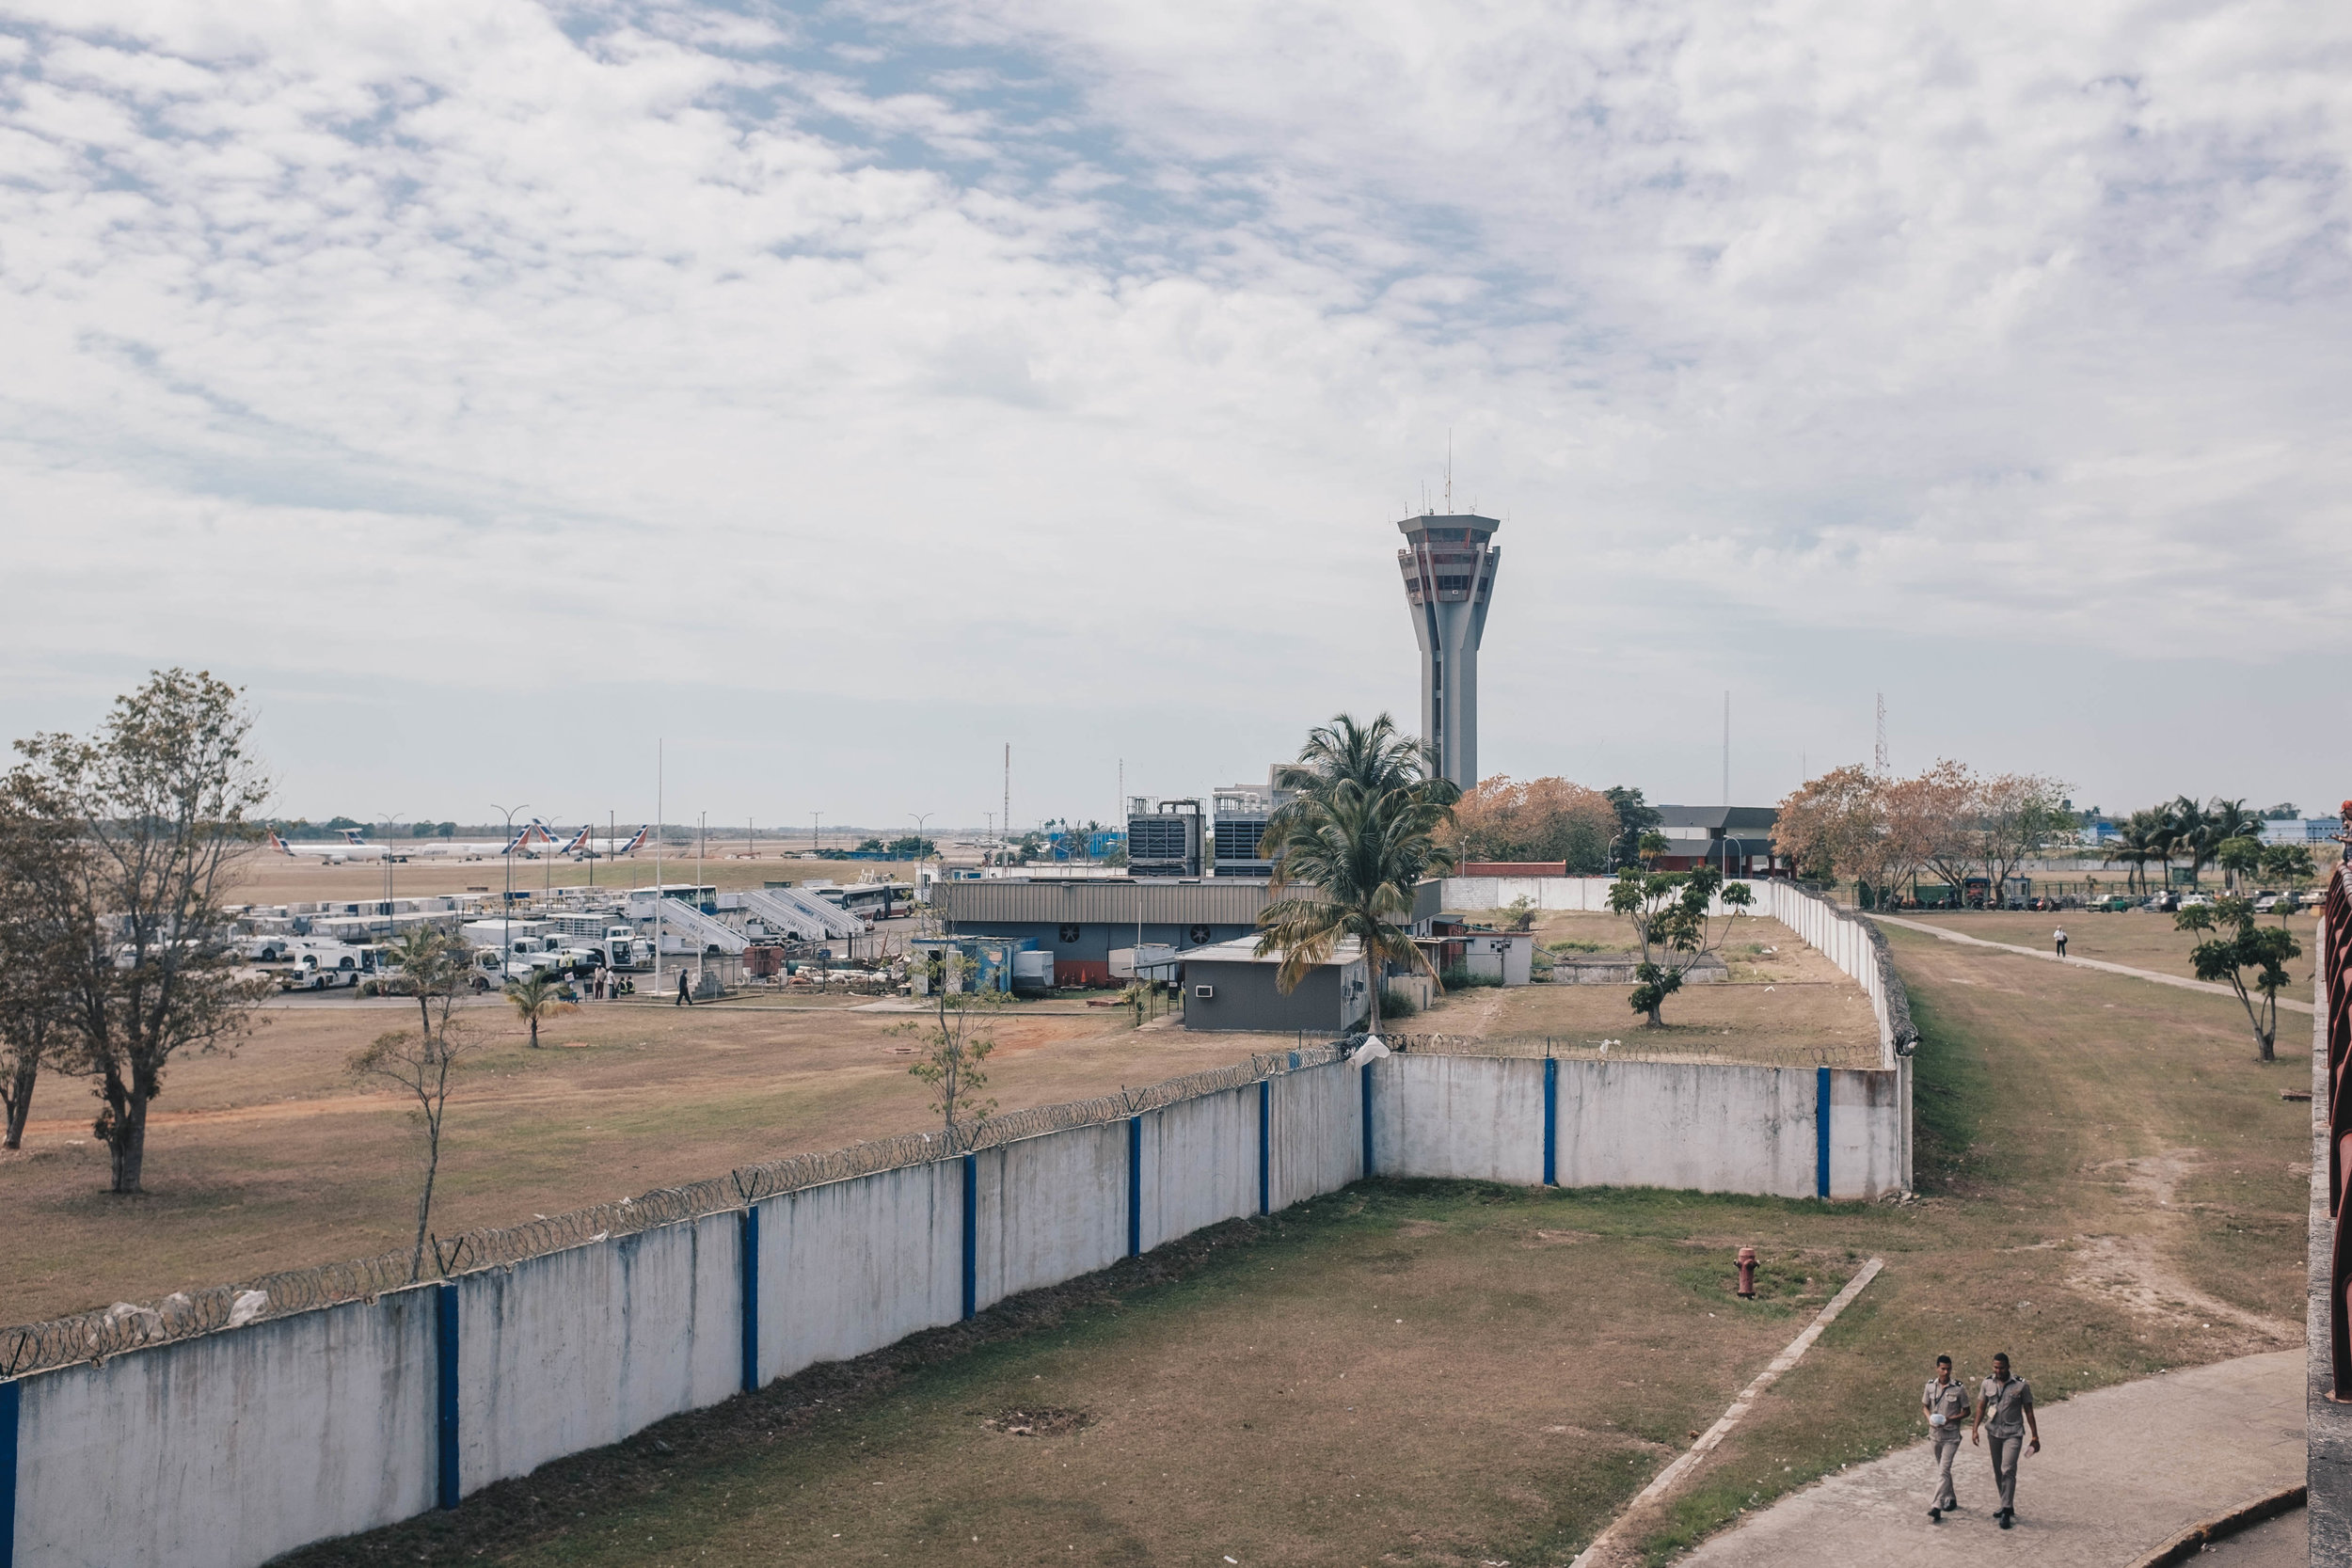 havana-cuba-airport-transportation.jpg